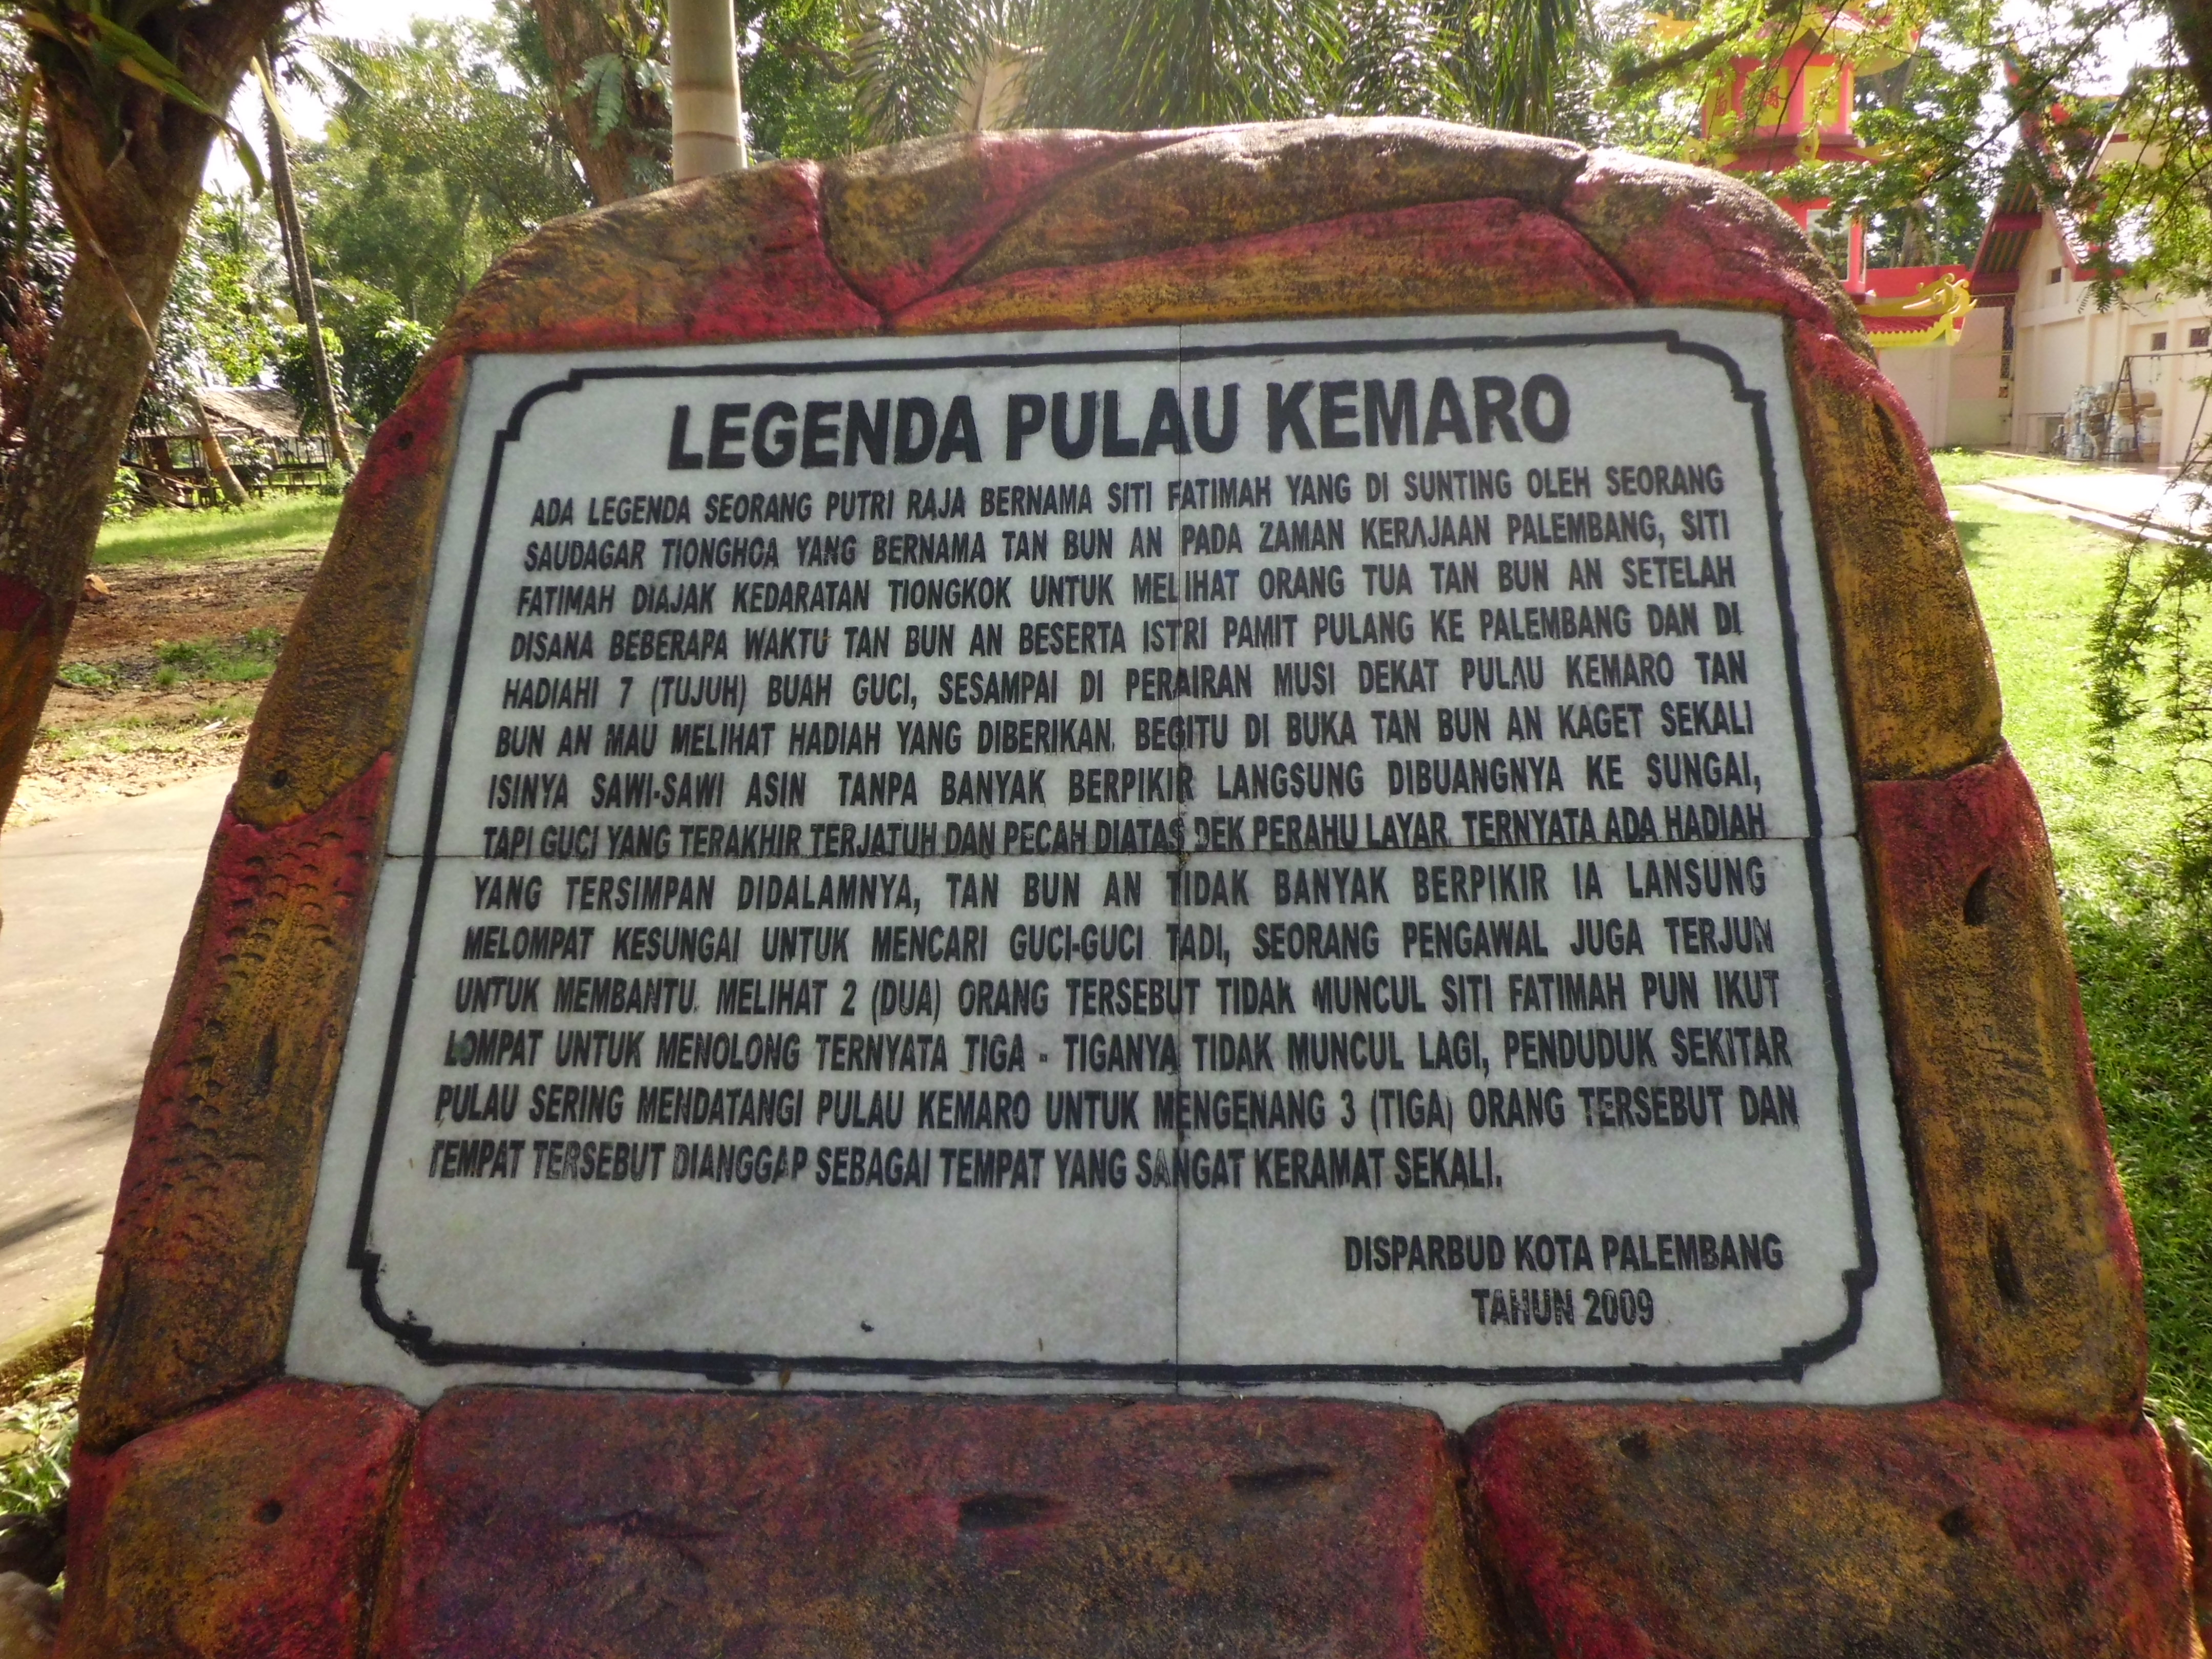 Wisata Pulau Kemaro Rainbow Life Legenda Kota Palembang